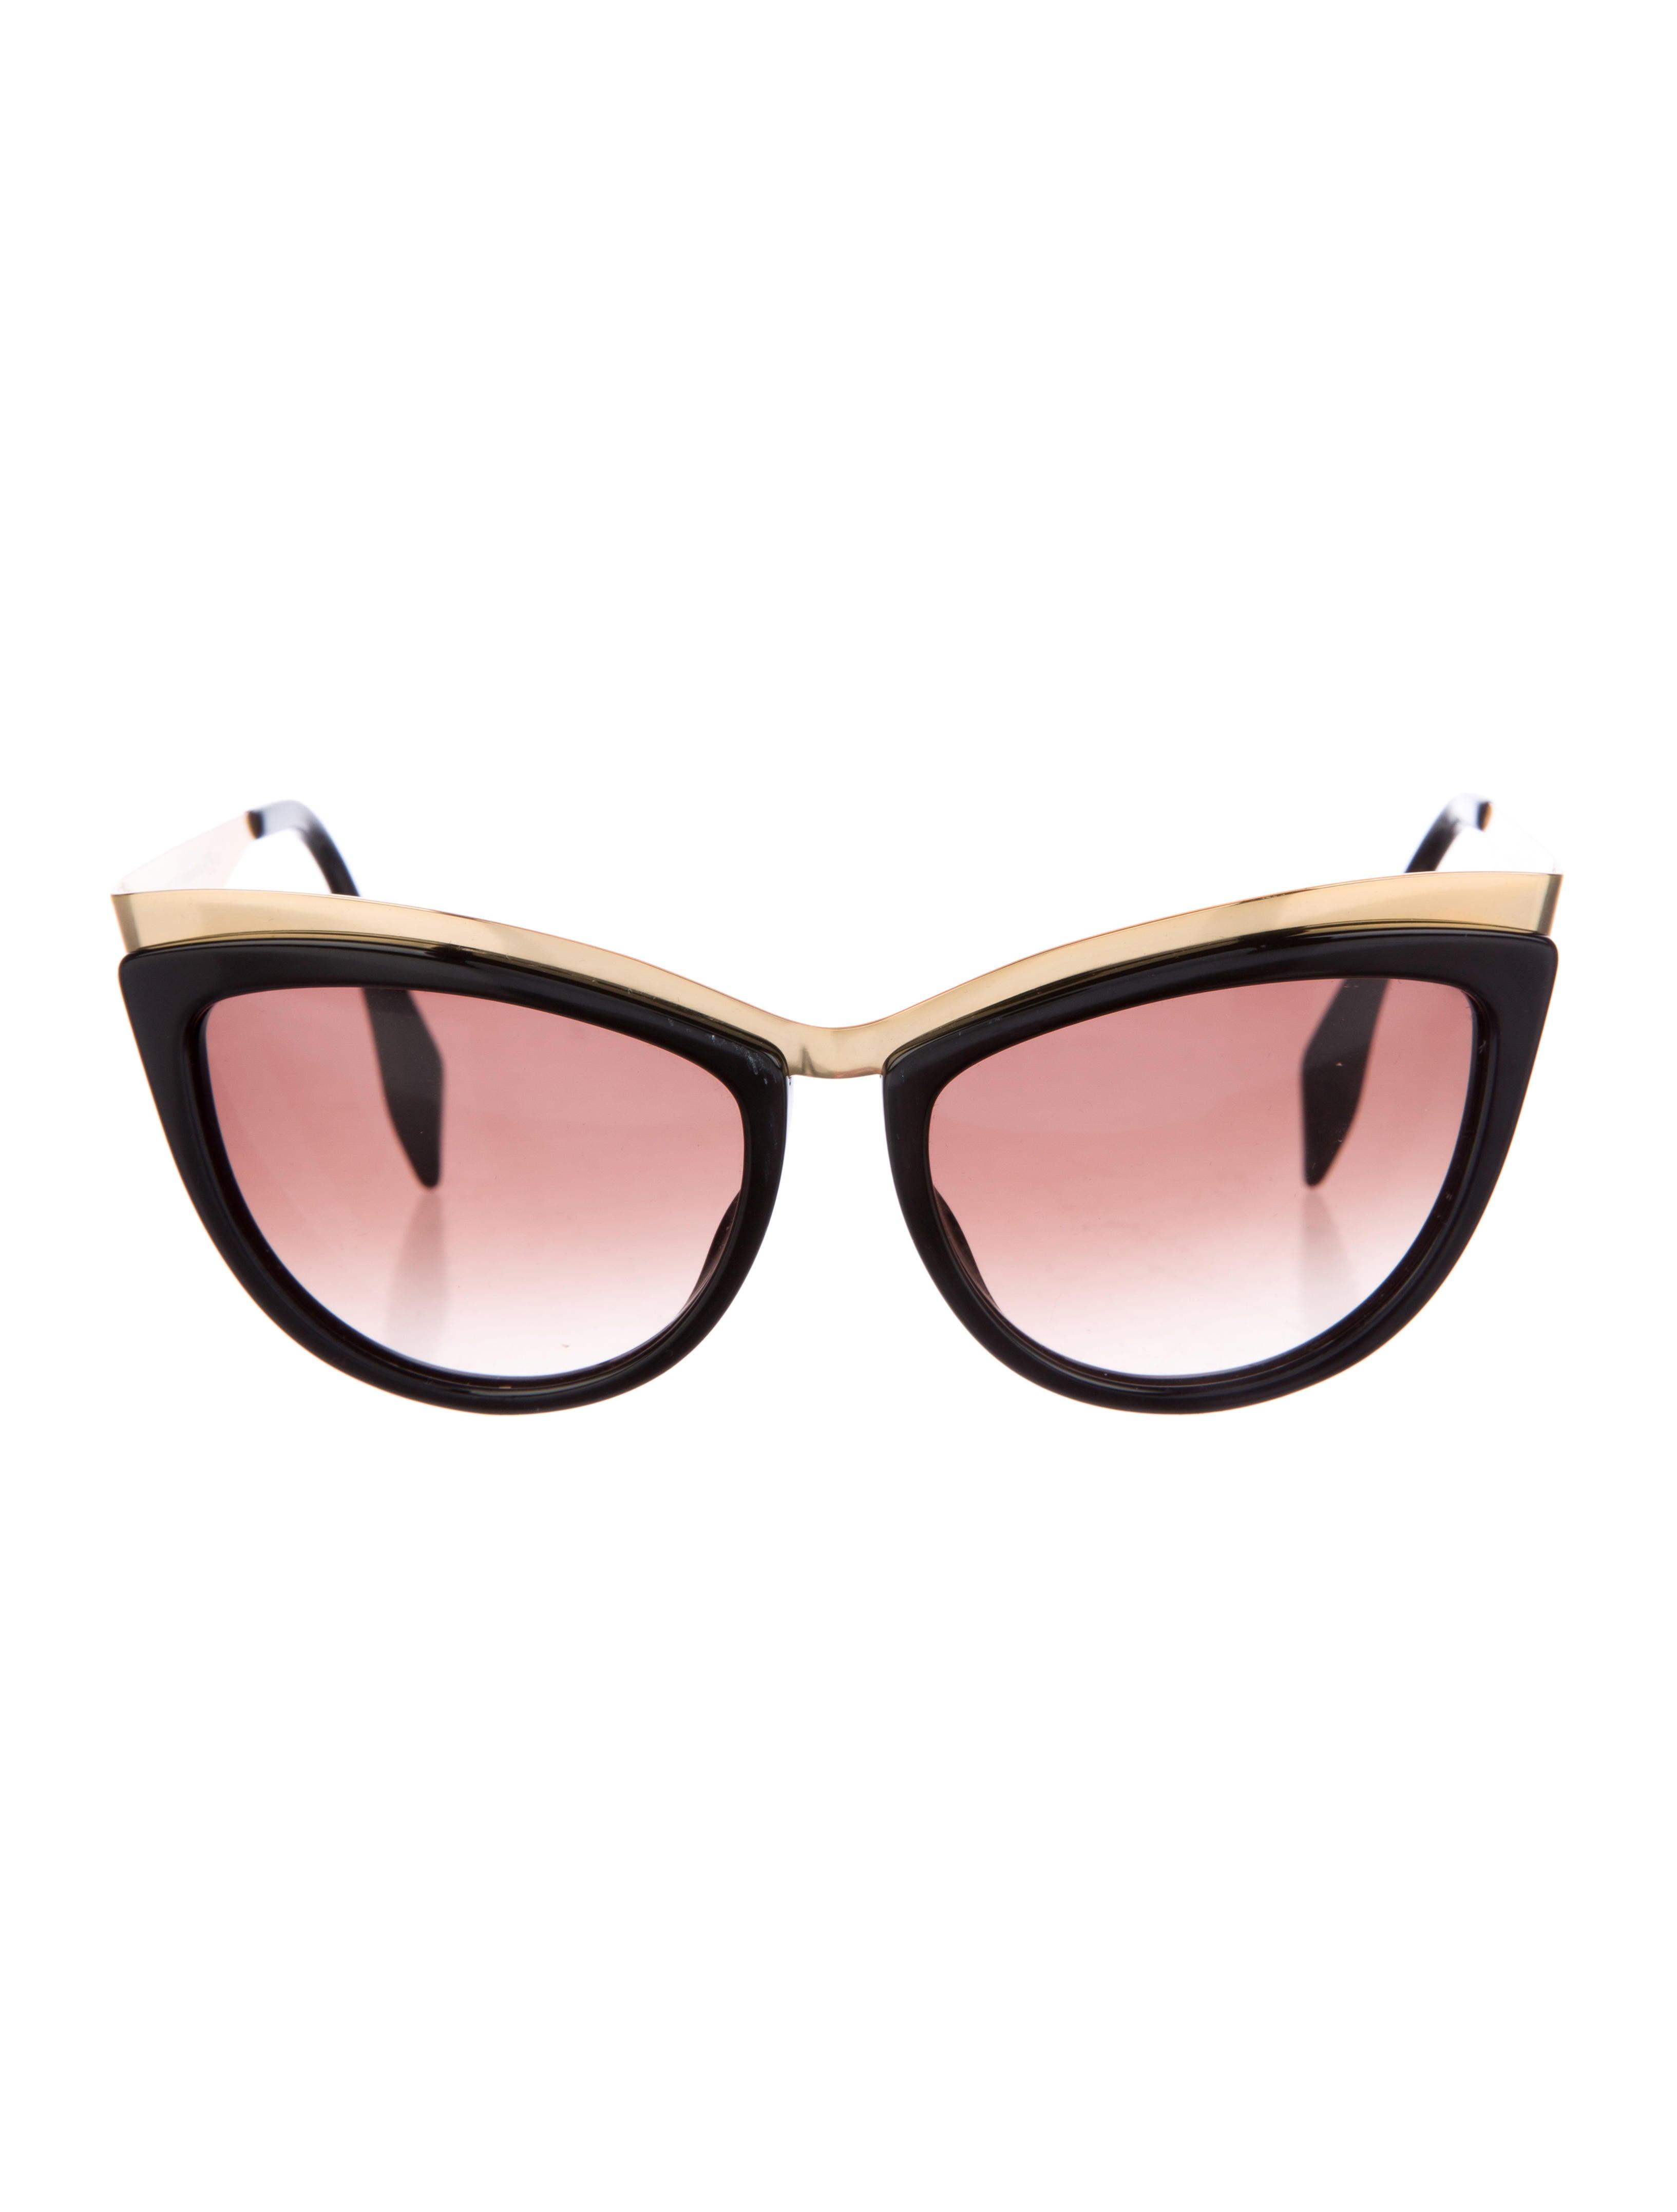 Alexander Mcqueen Cateye Sunglasses  alexander mcqueen cat eye tinted sunglasses accessories